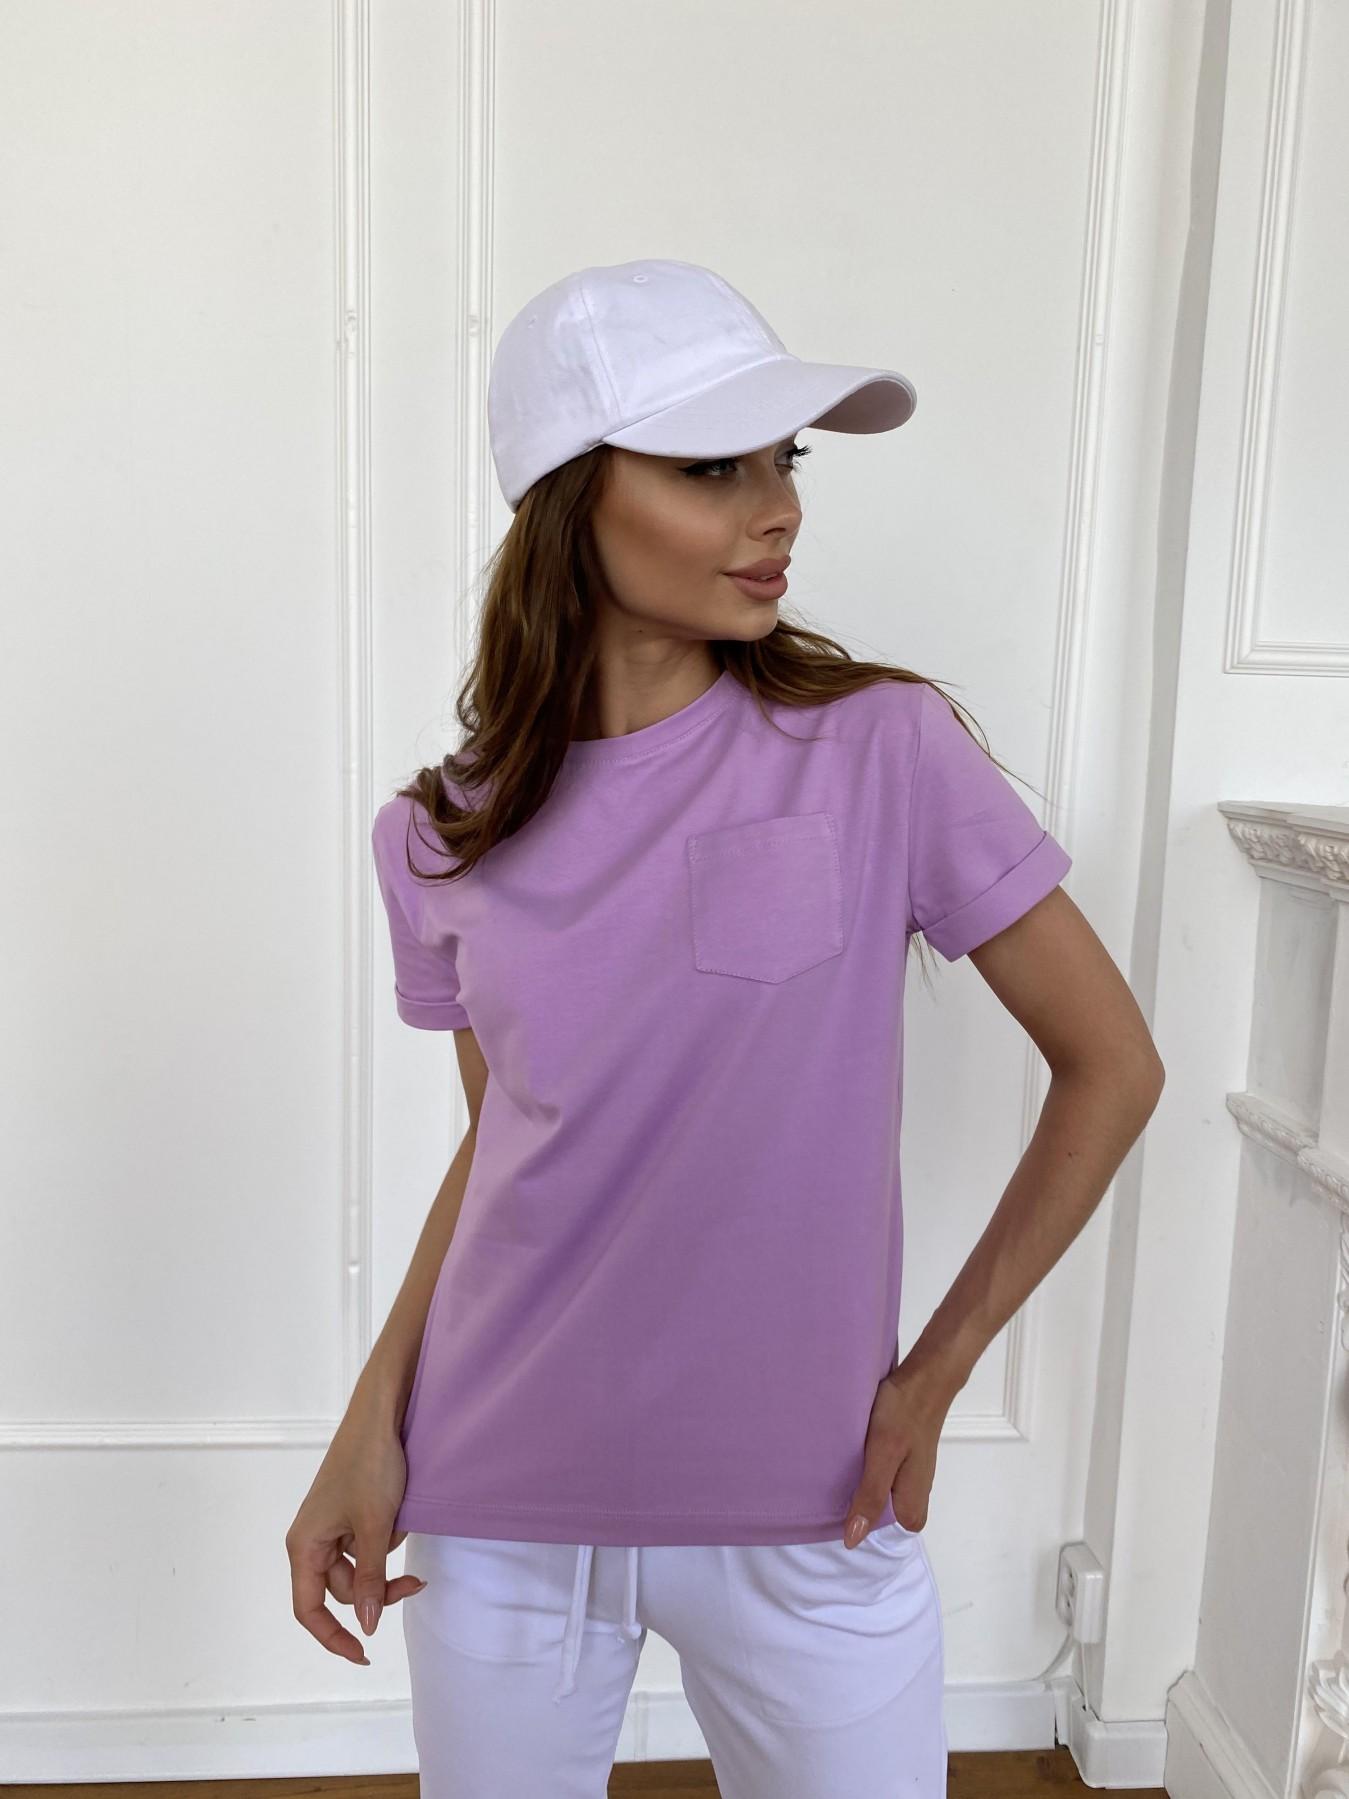 Вуди футболка из вискозы 11224 АРТ. 47879 Цвет: Лаванда - фото 6, интернет магазин tm-modus.ru